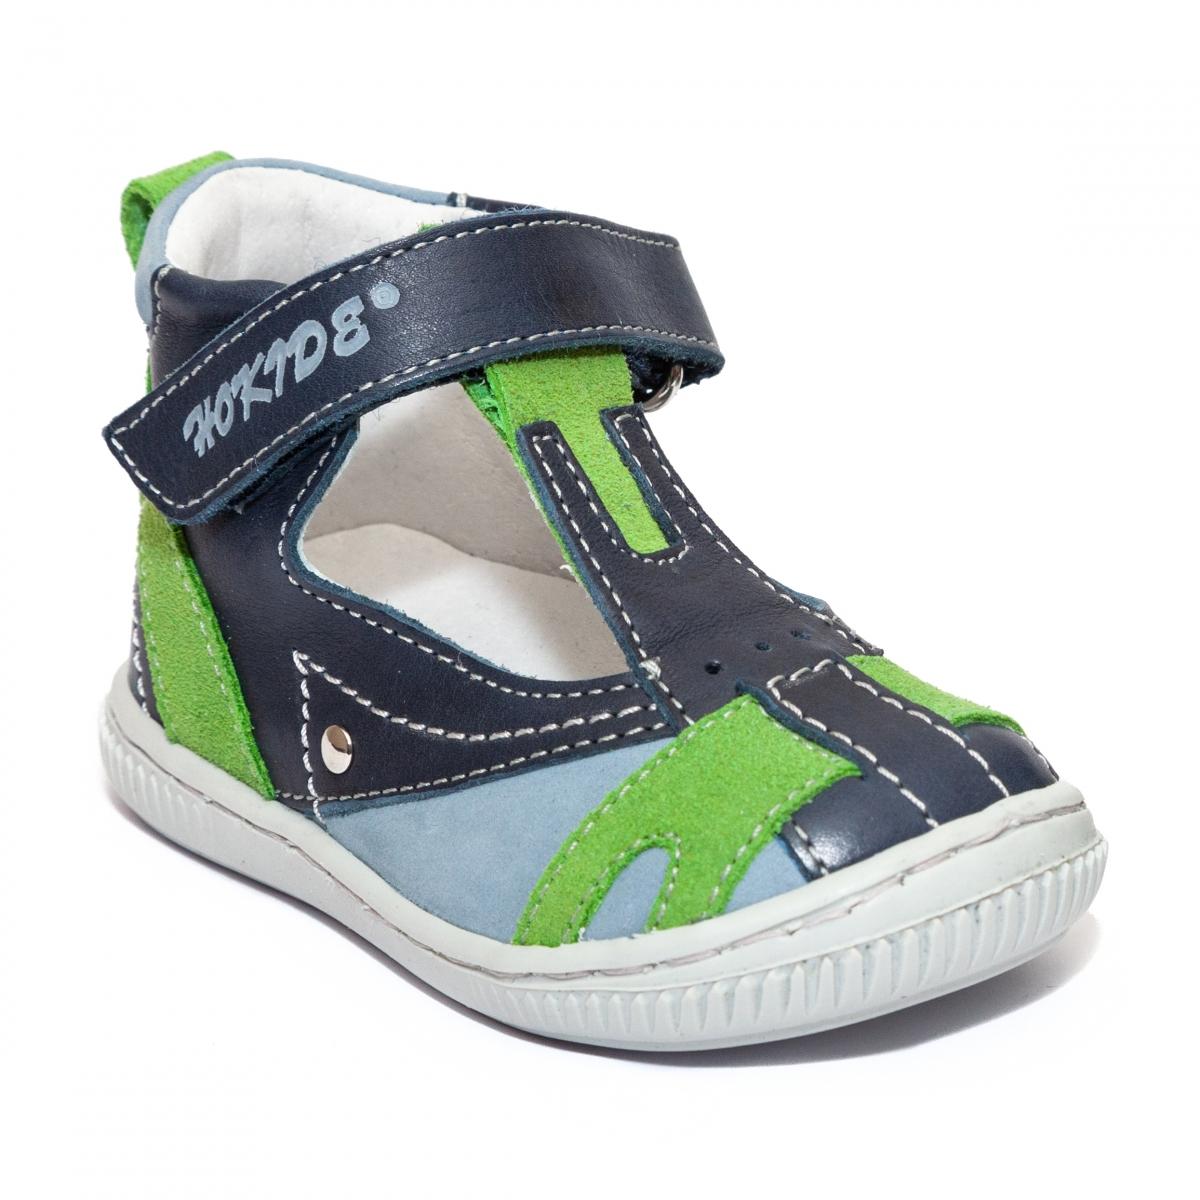 Sandale ortopedice baieti hokide 306 blu verde 18-25